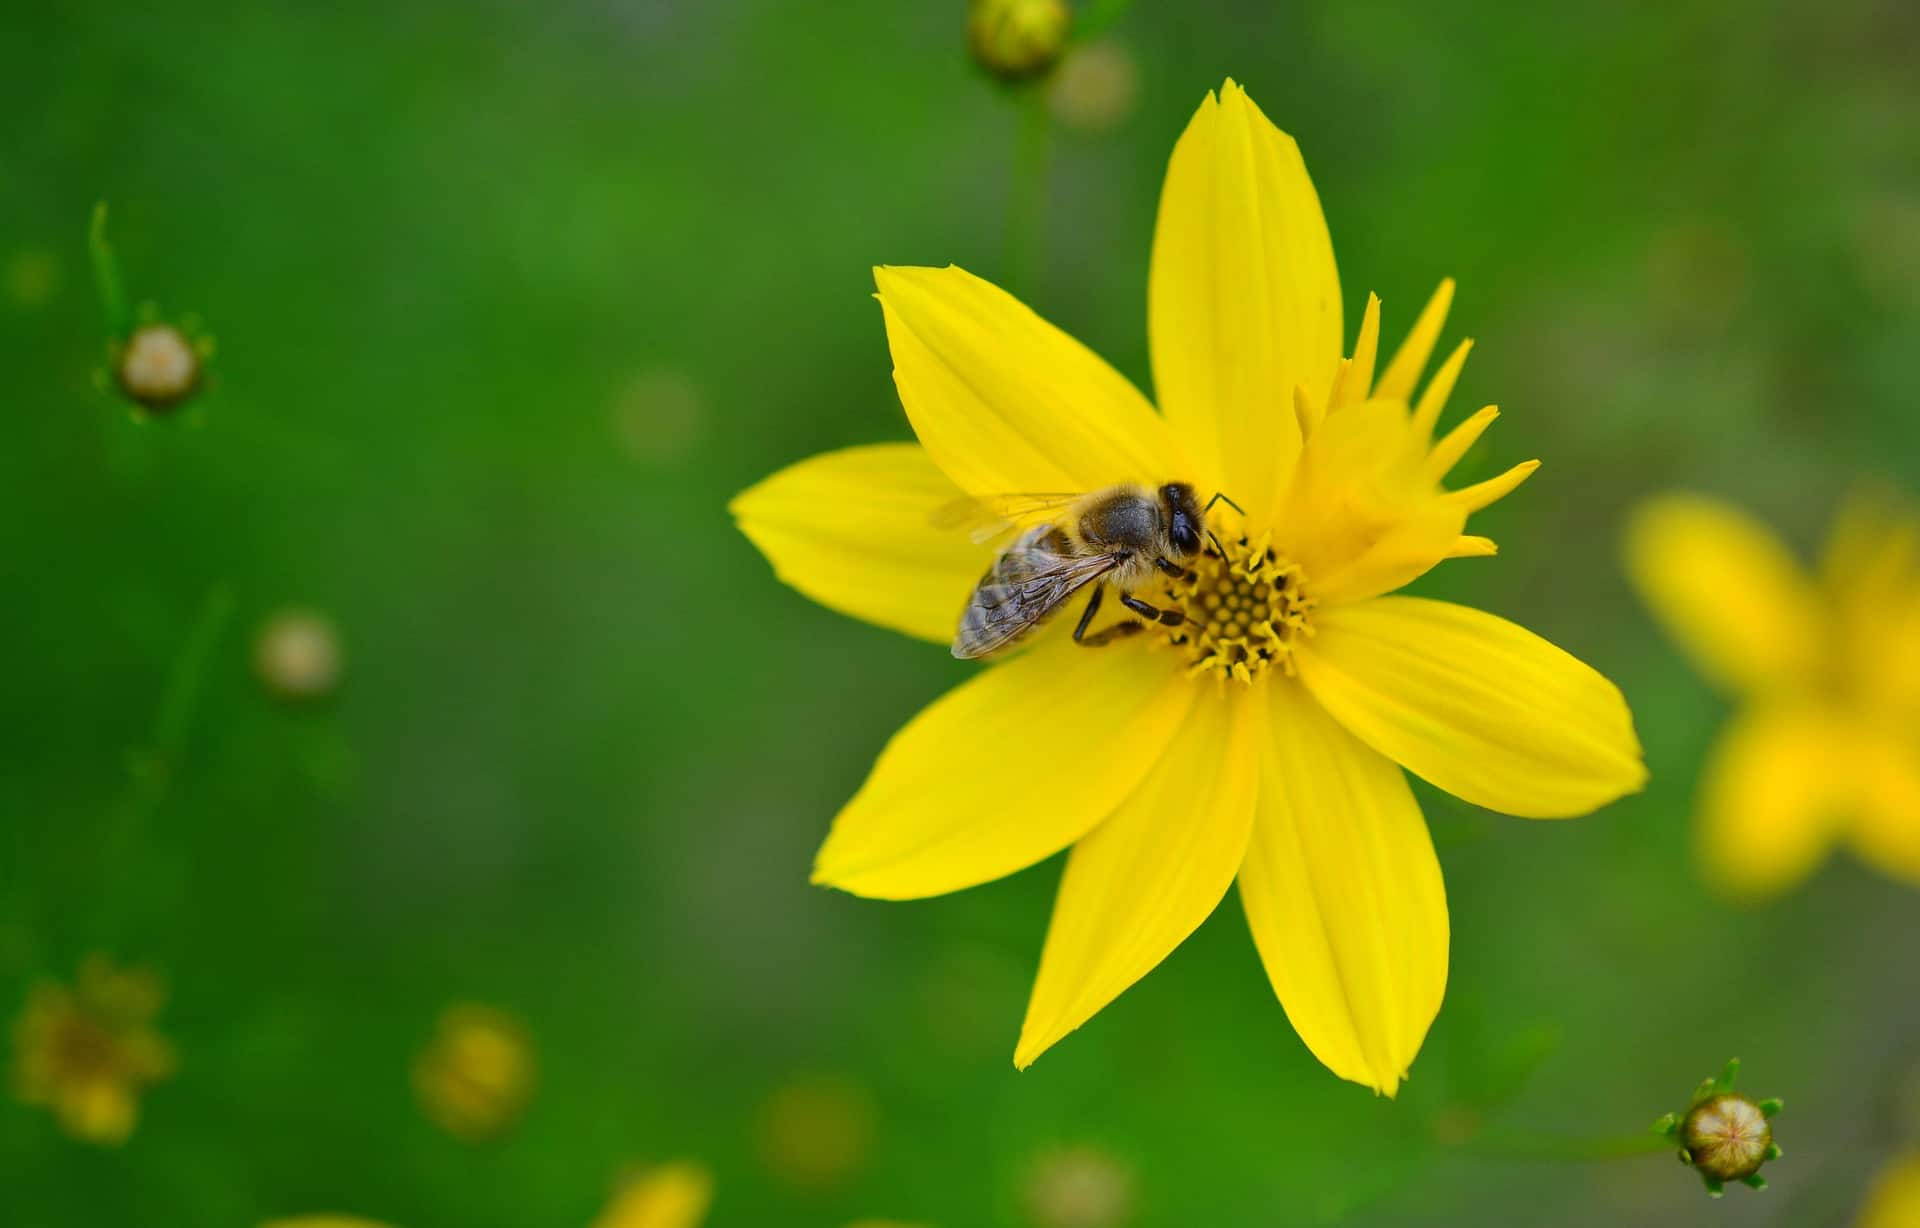 Bee pollinating yellow flower